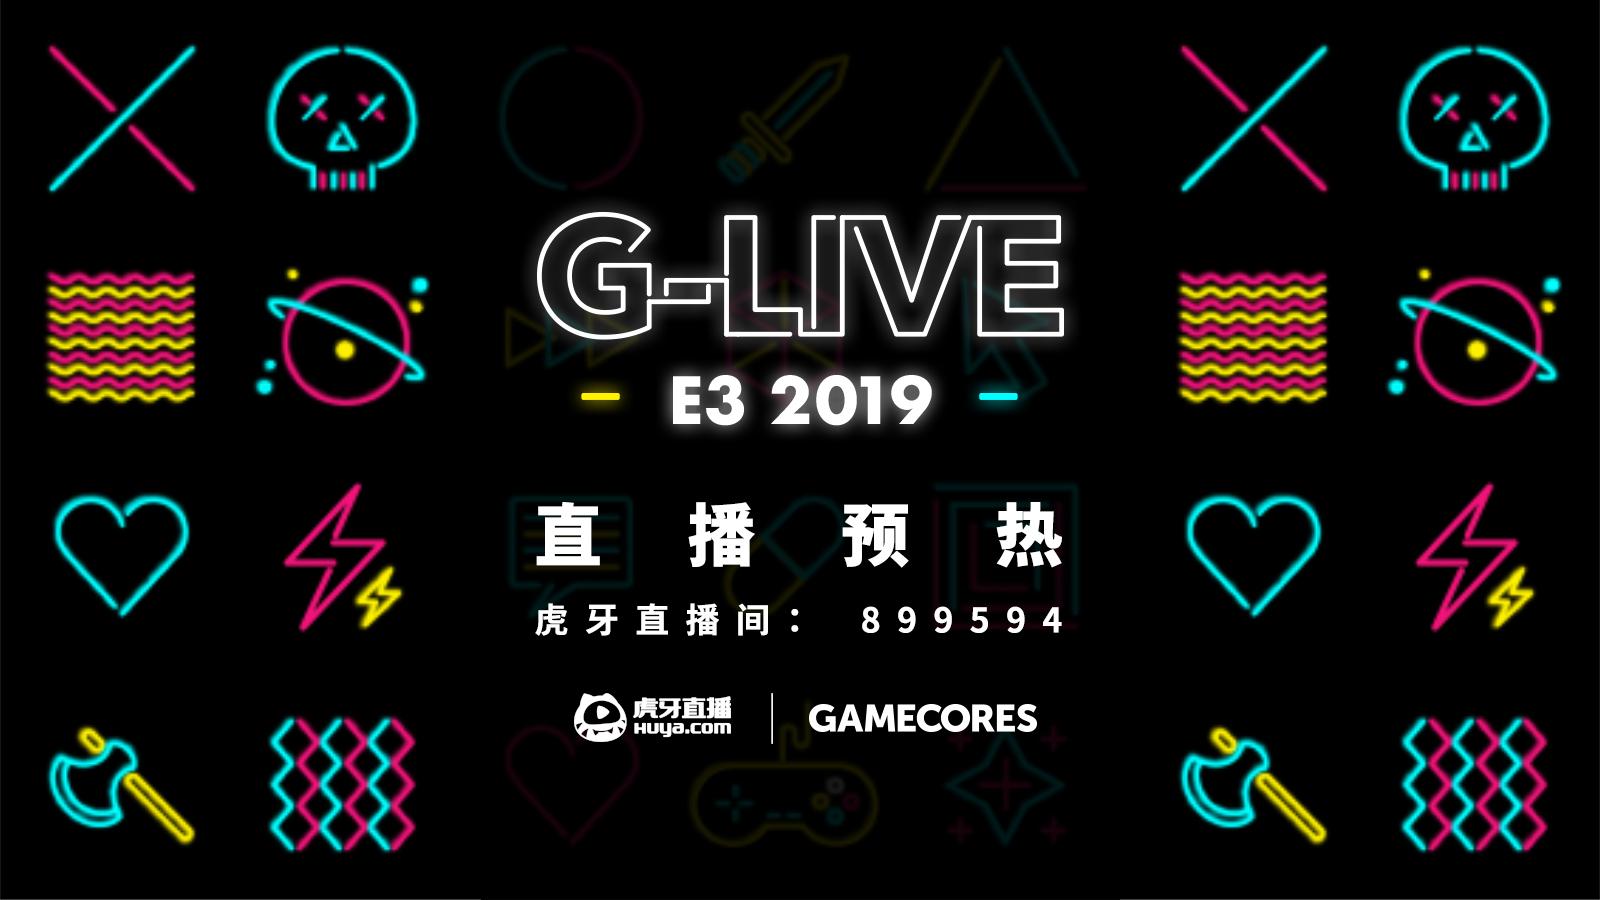 E3 2019要来了,来虎牙直播找我们玩吧!